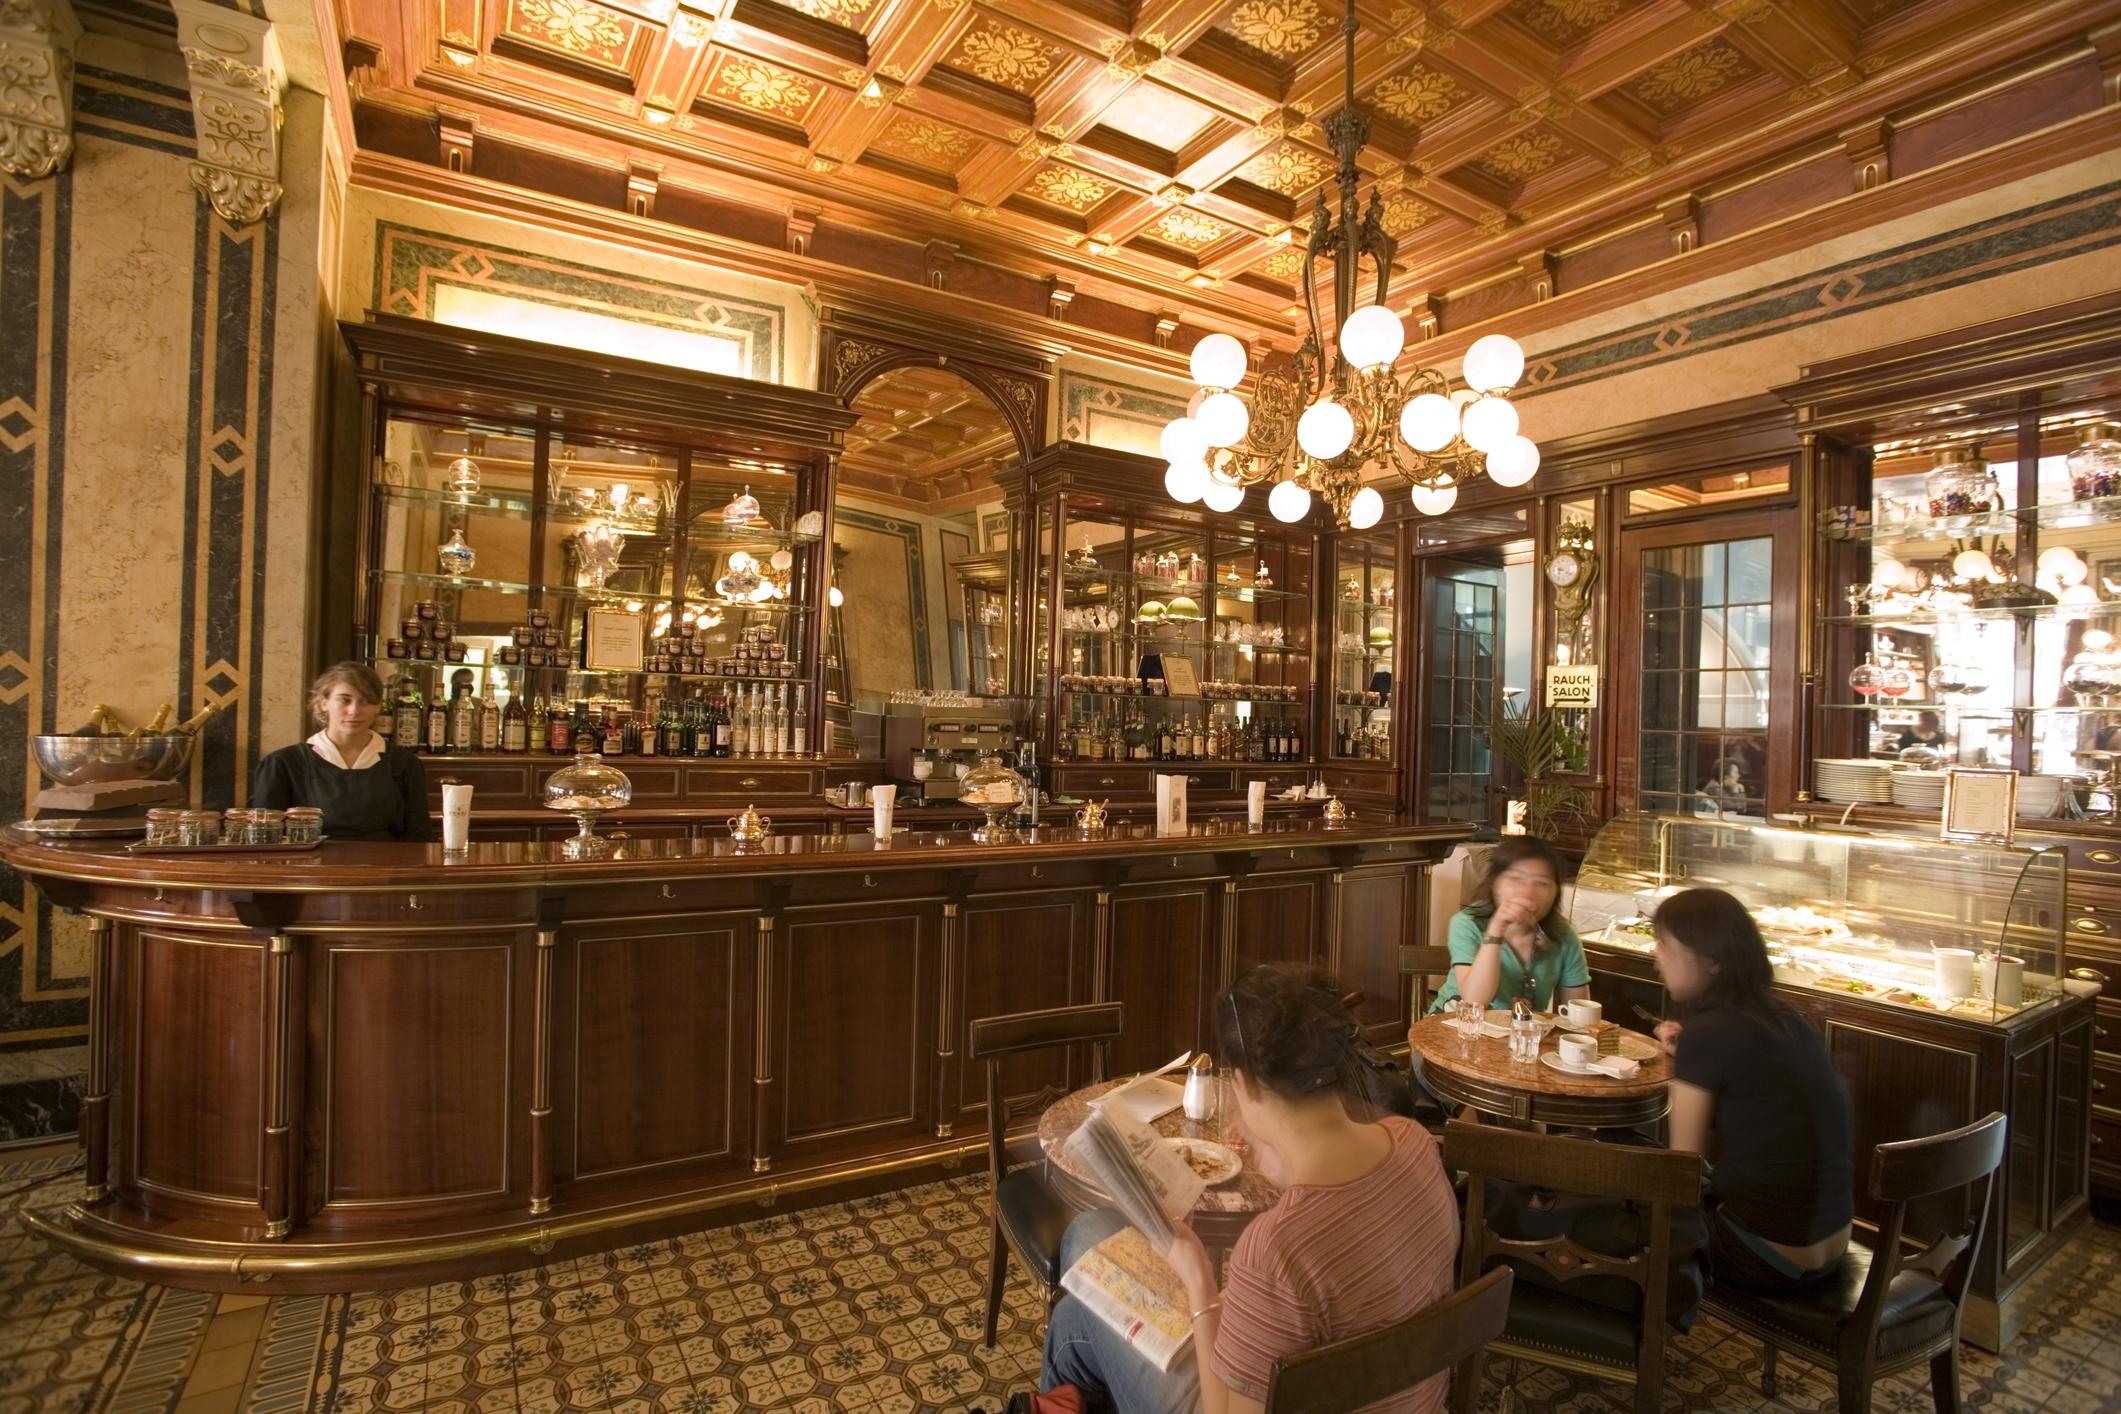 Inside Cafe Demel, Vienna, Austria